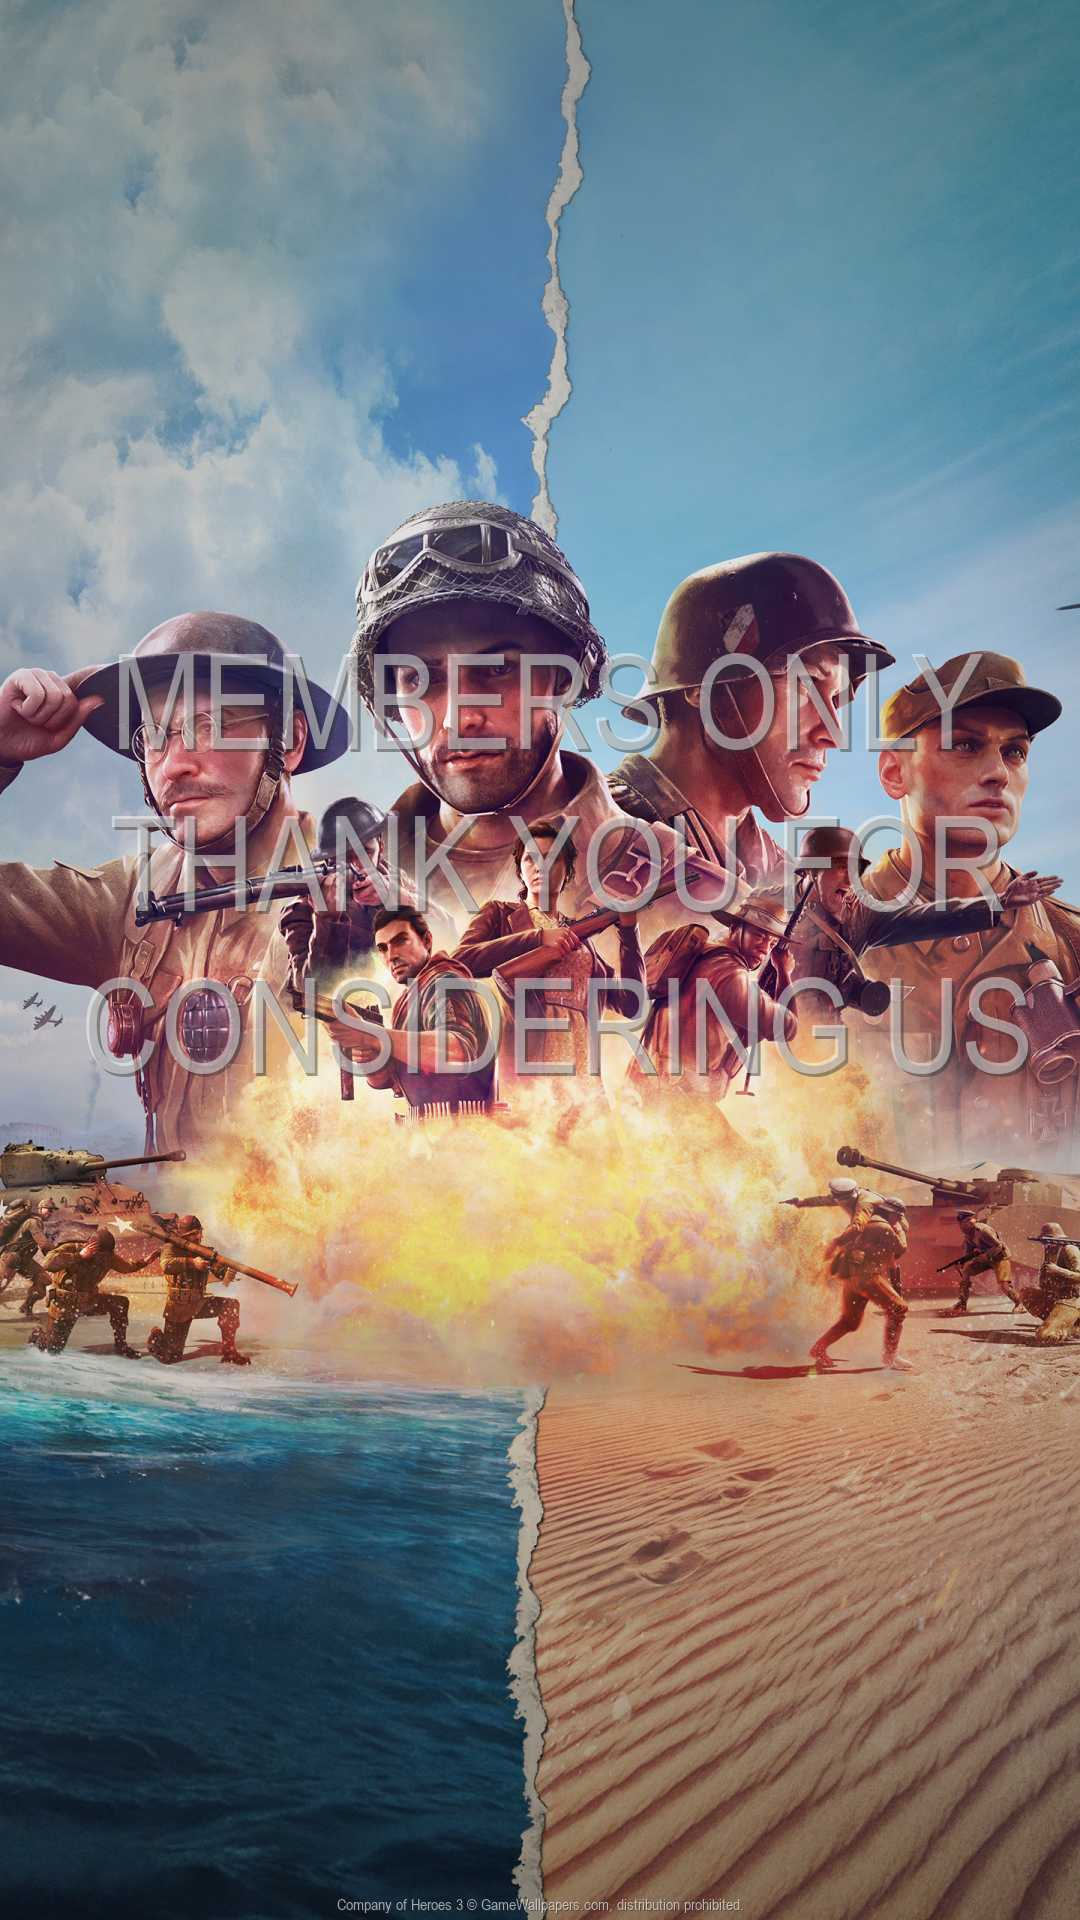 Company of Heroes 3 1080p Vertical Mobile fond d'écran 01